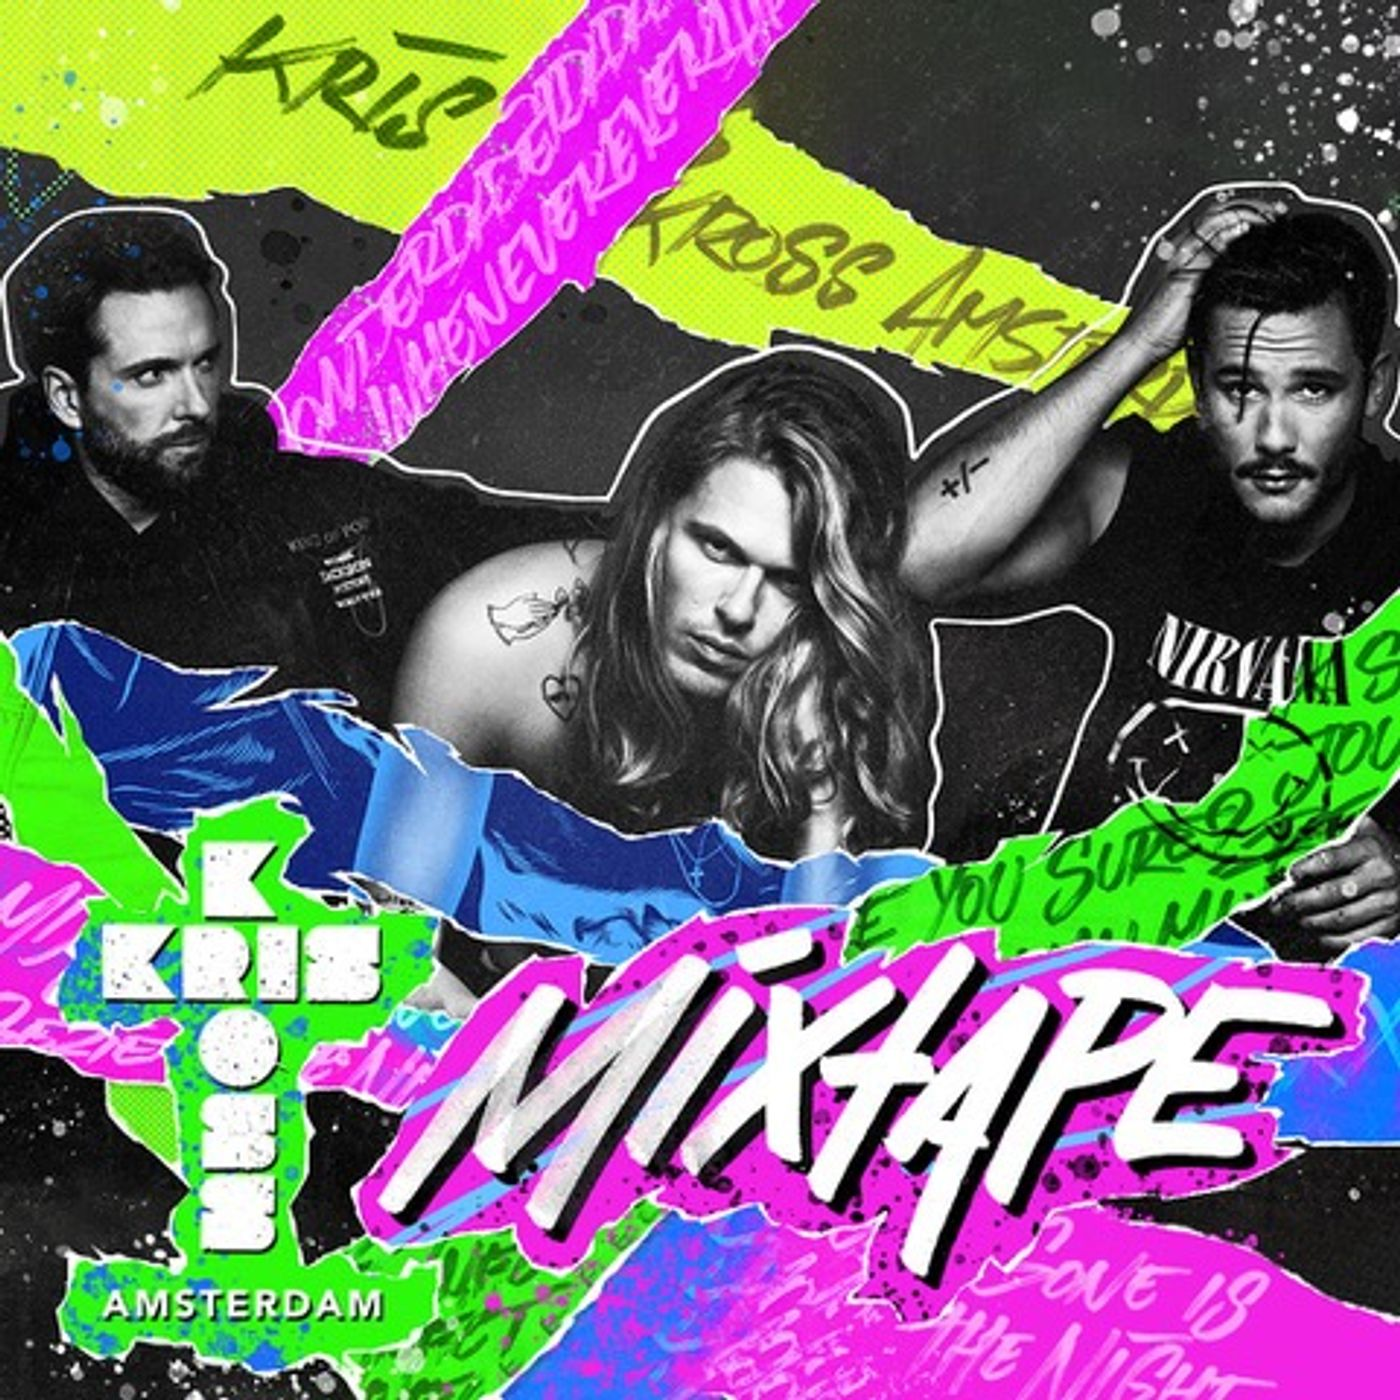 Kris Kross Amsterdam | Kris Kross Mixtape #119